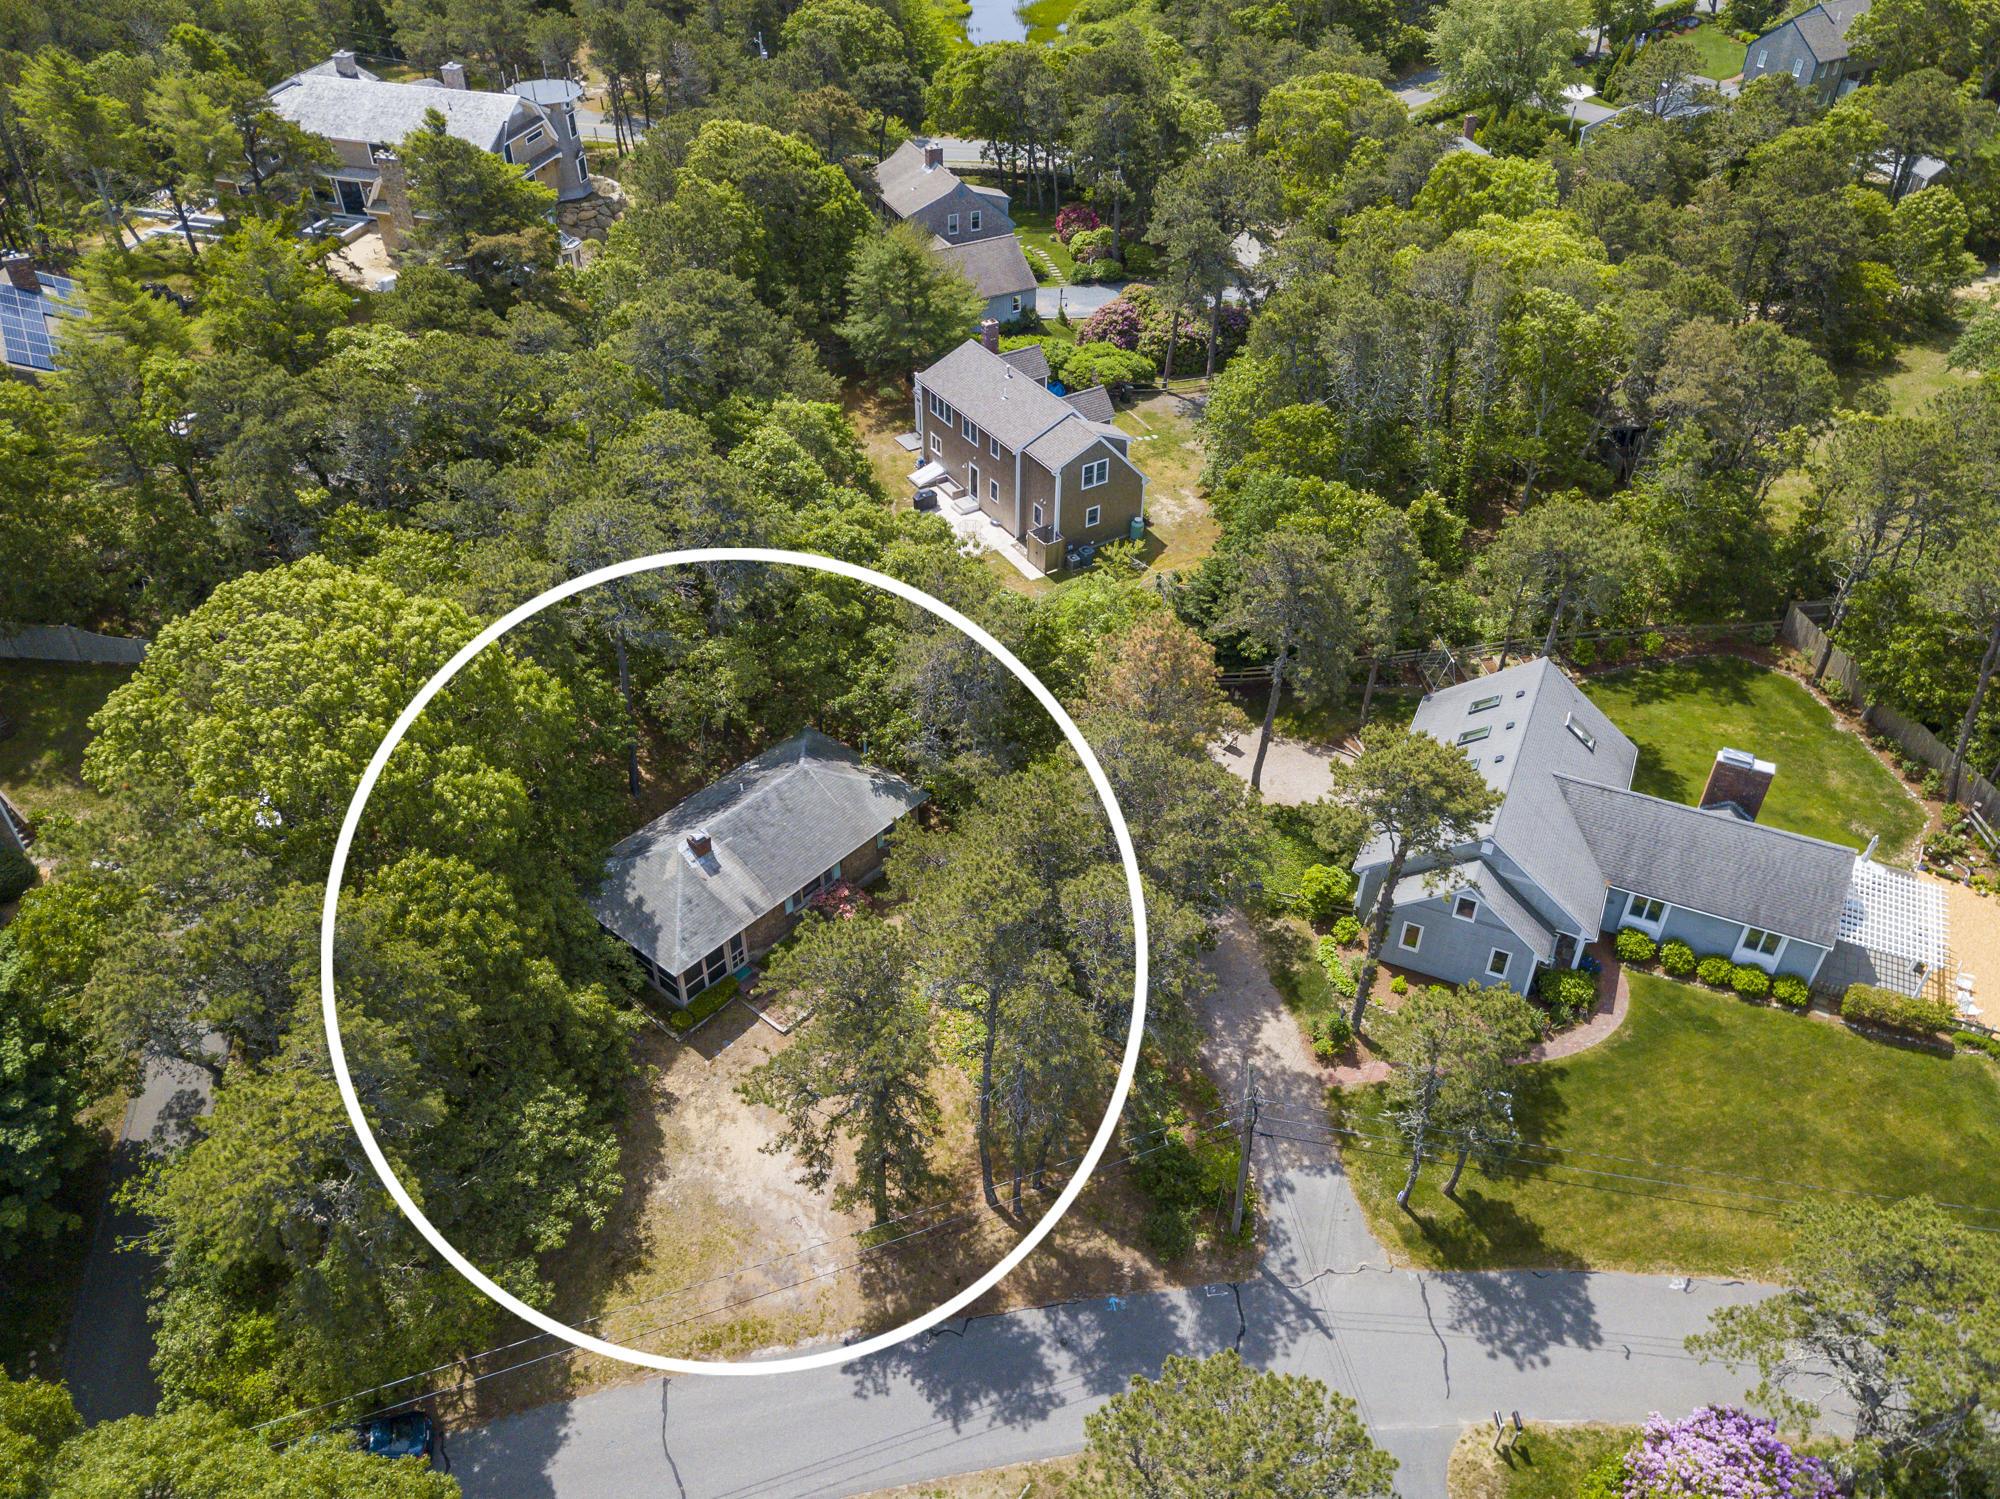 117 Bucks Creek Road, Chatham MA, 02633 - slide 31